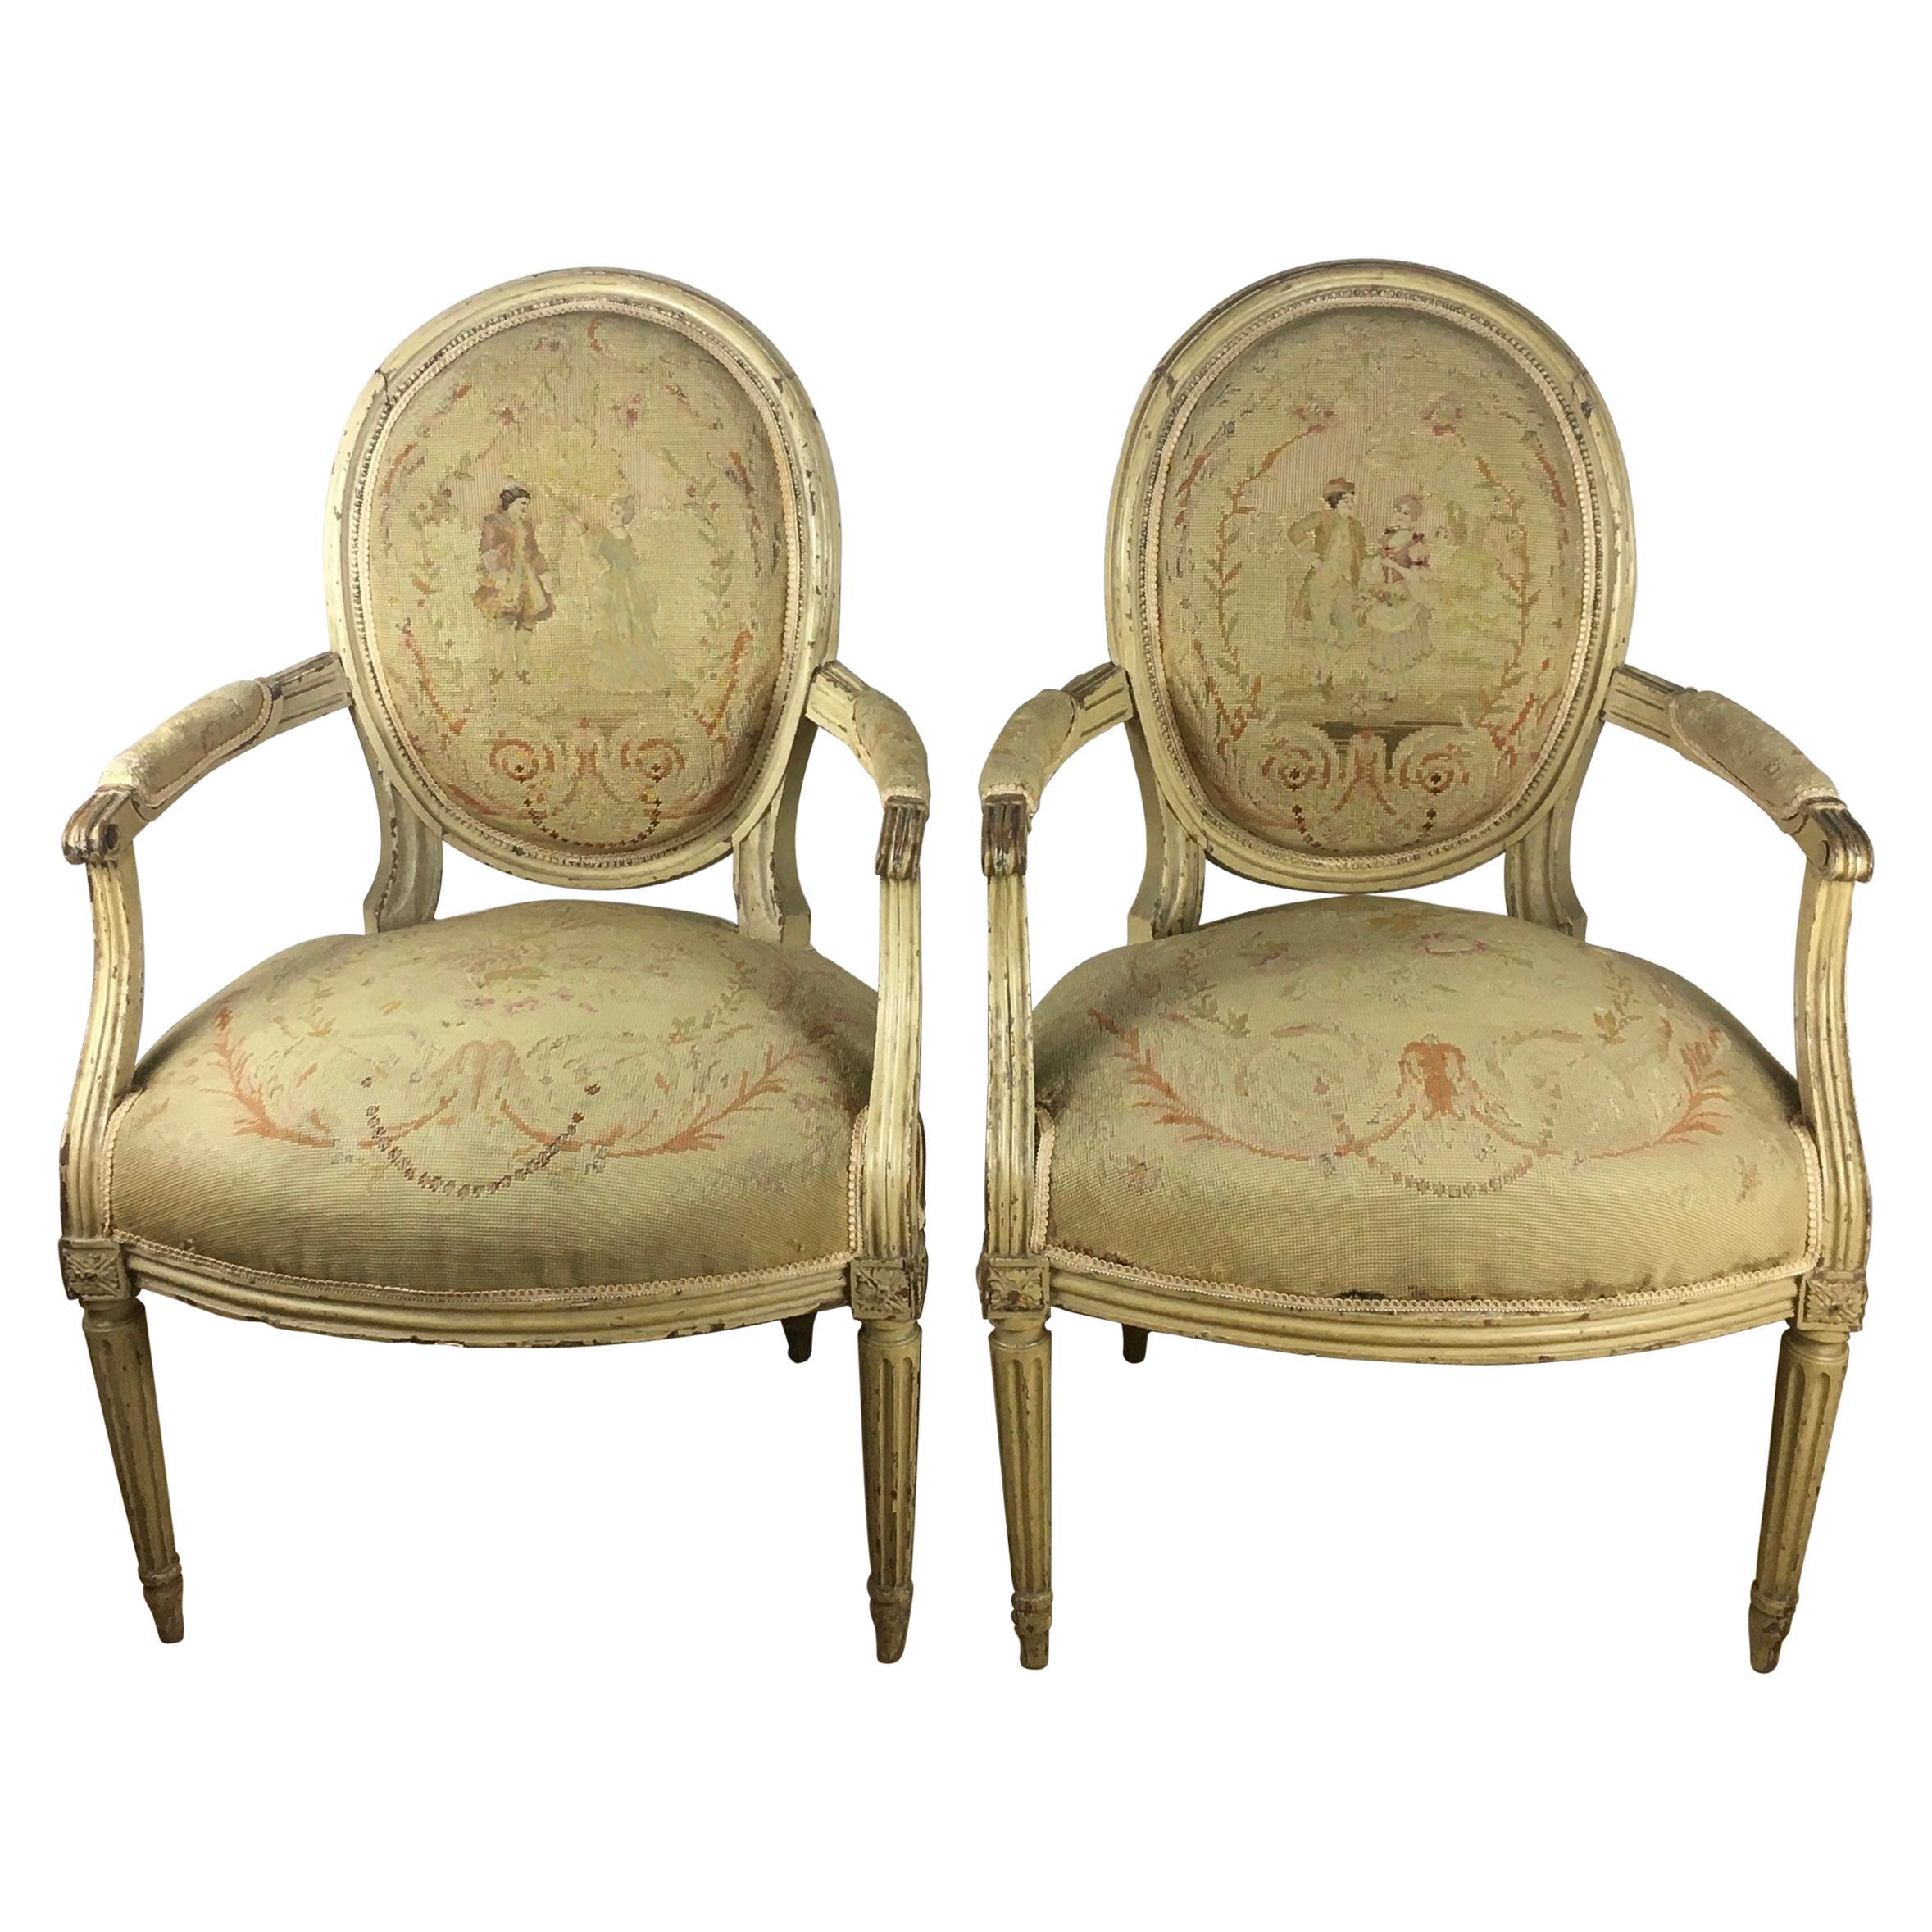 Rare Pair of 18th Century Louis XVI Style Armchairs or Fauteuils A La Reine